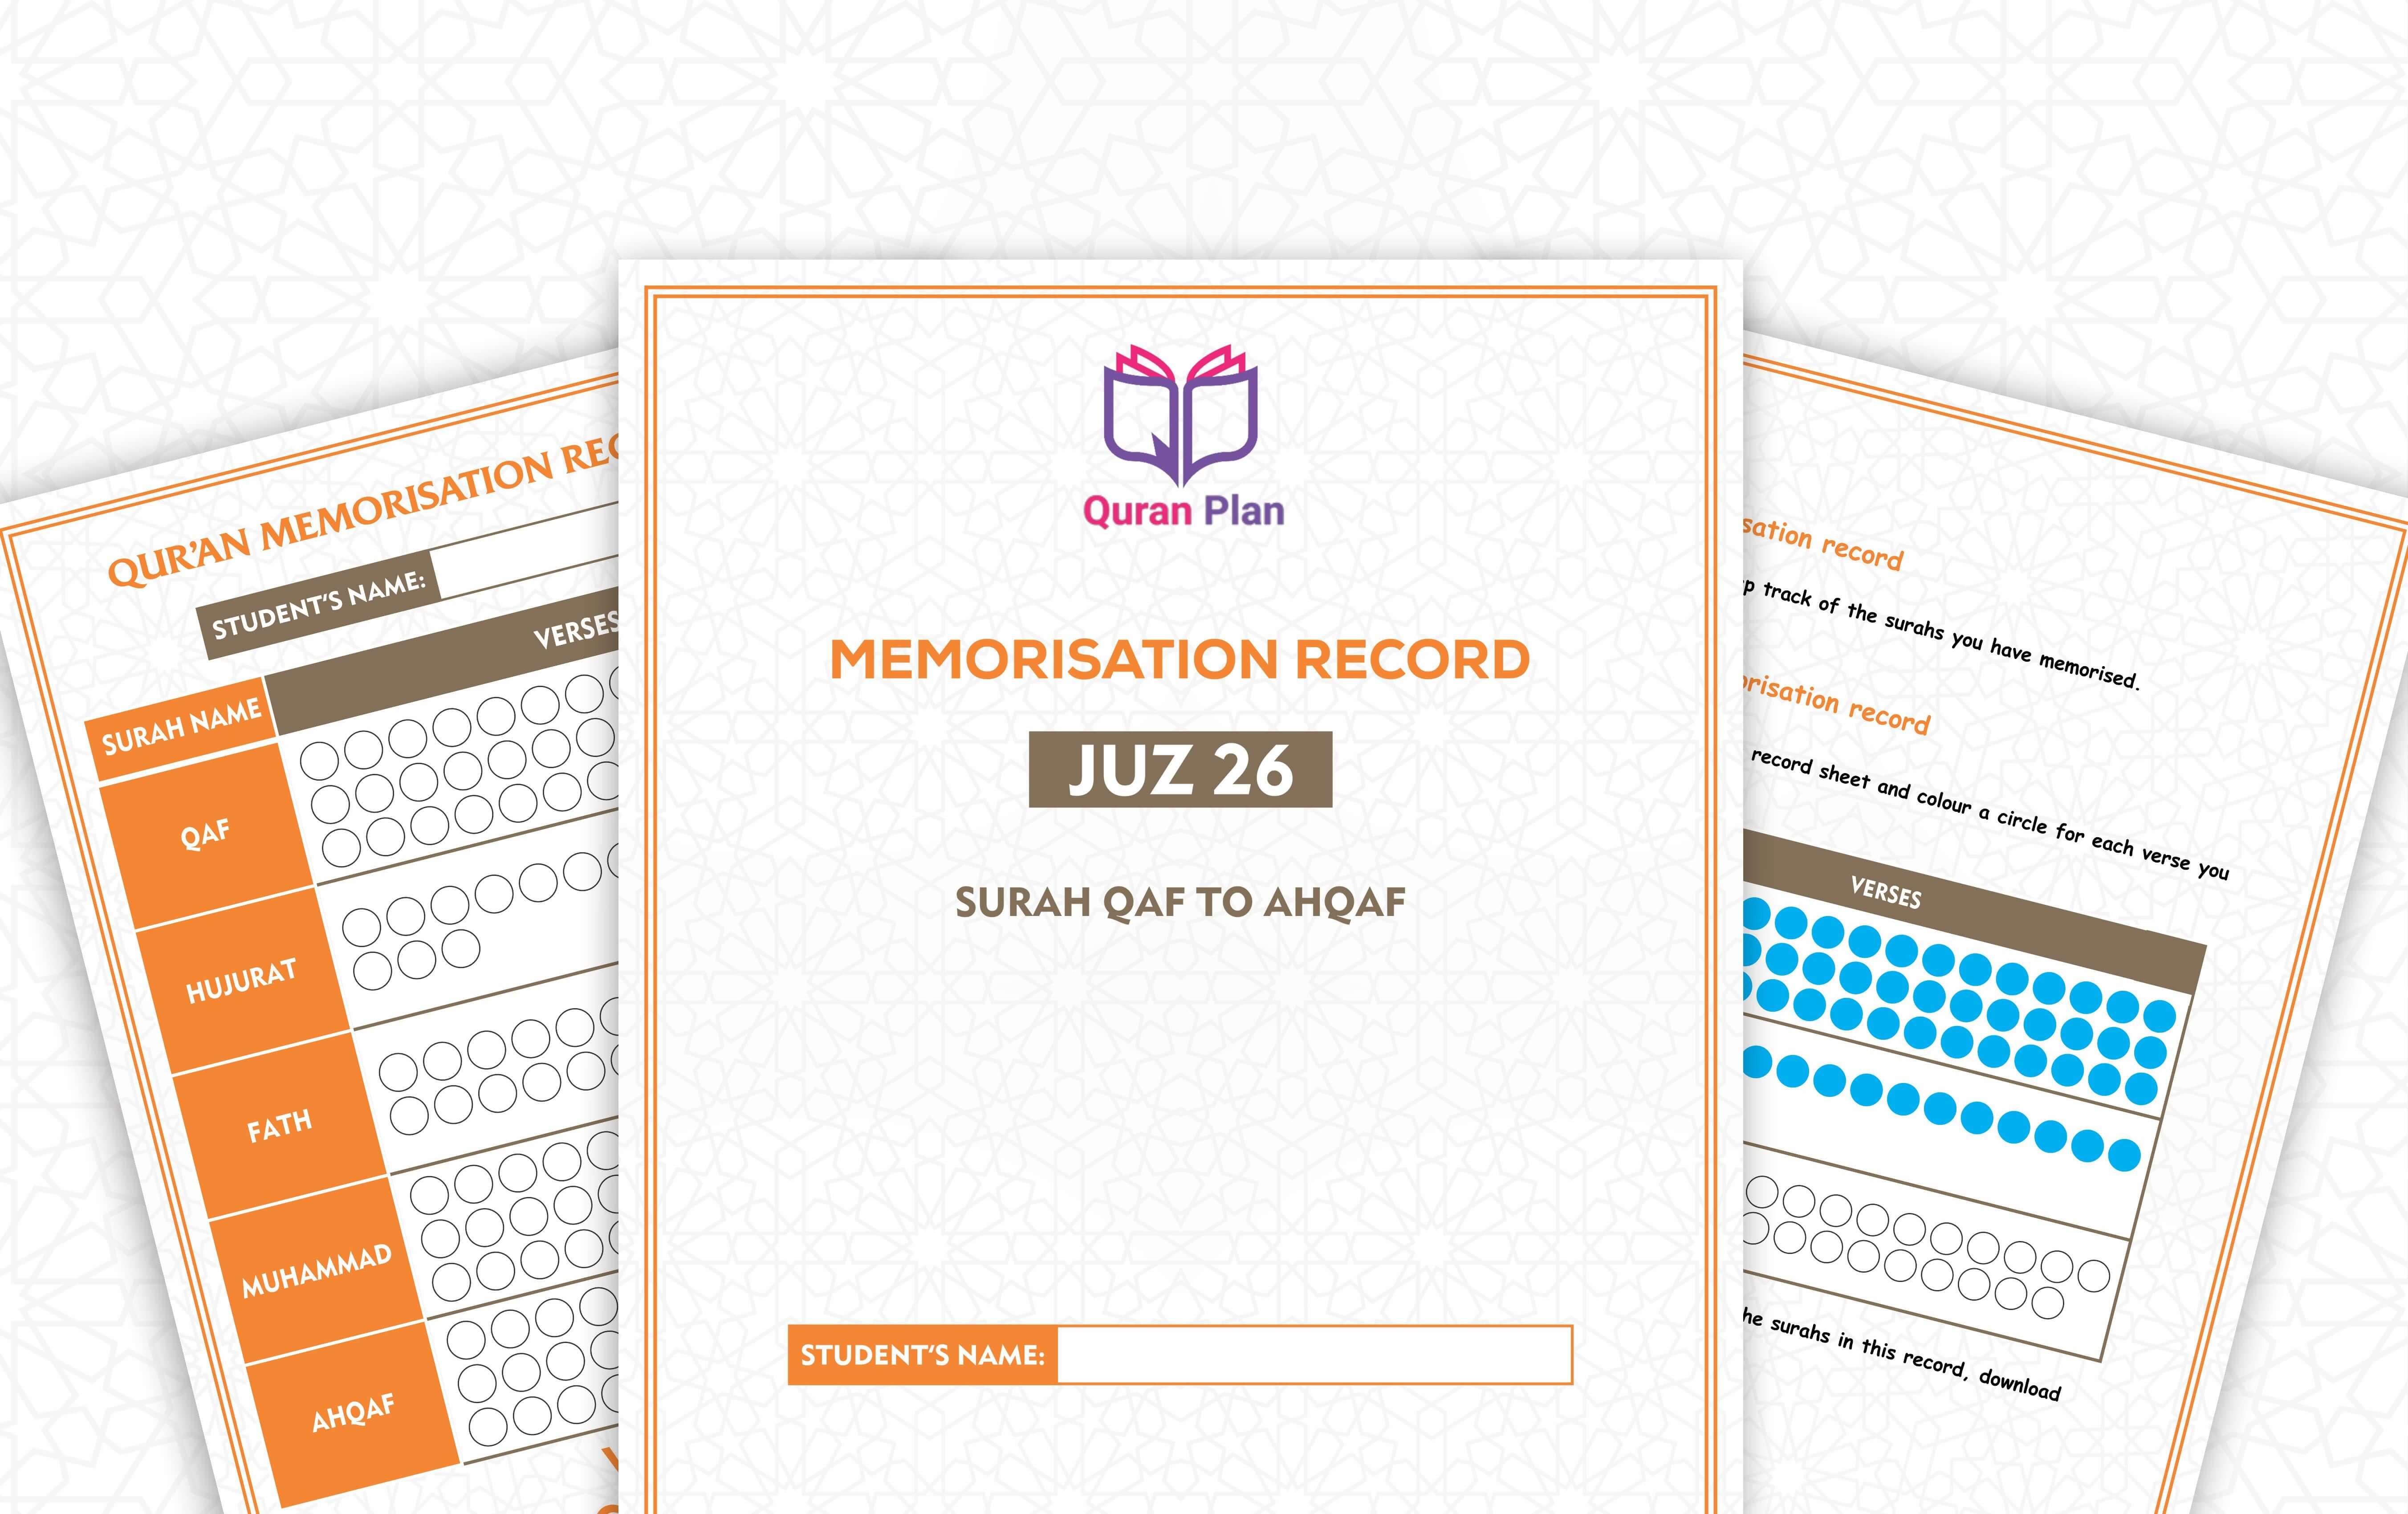 Juz 26 Hifdh Progress Chart